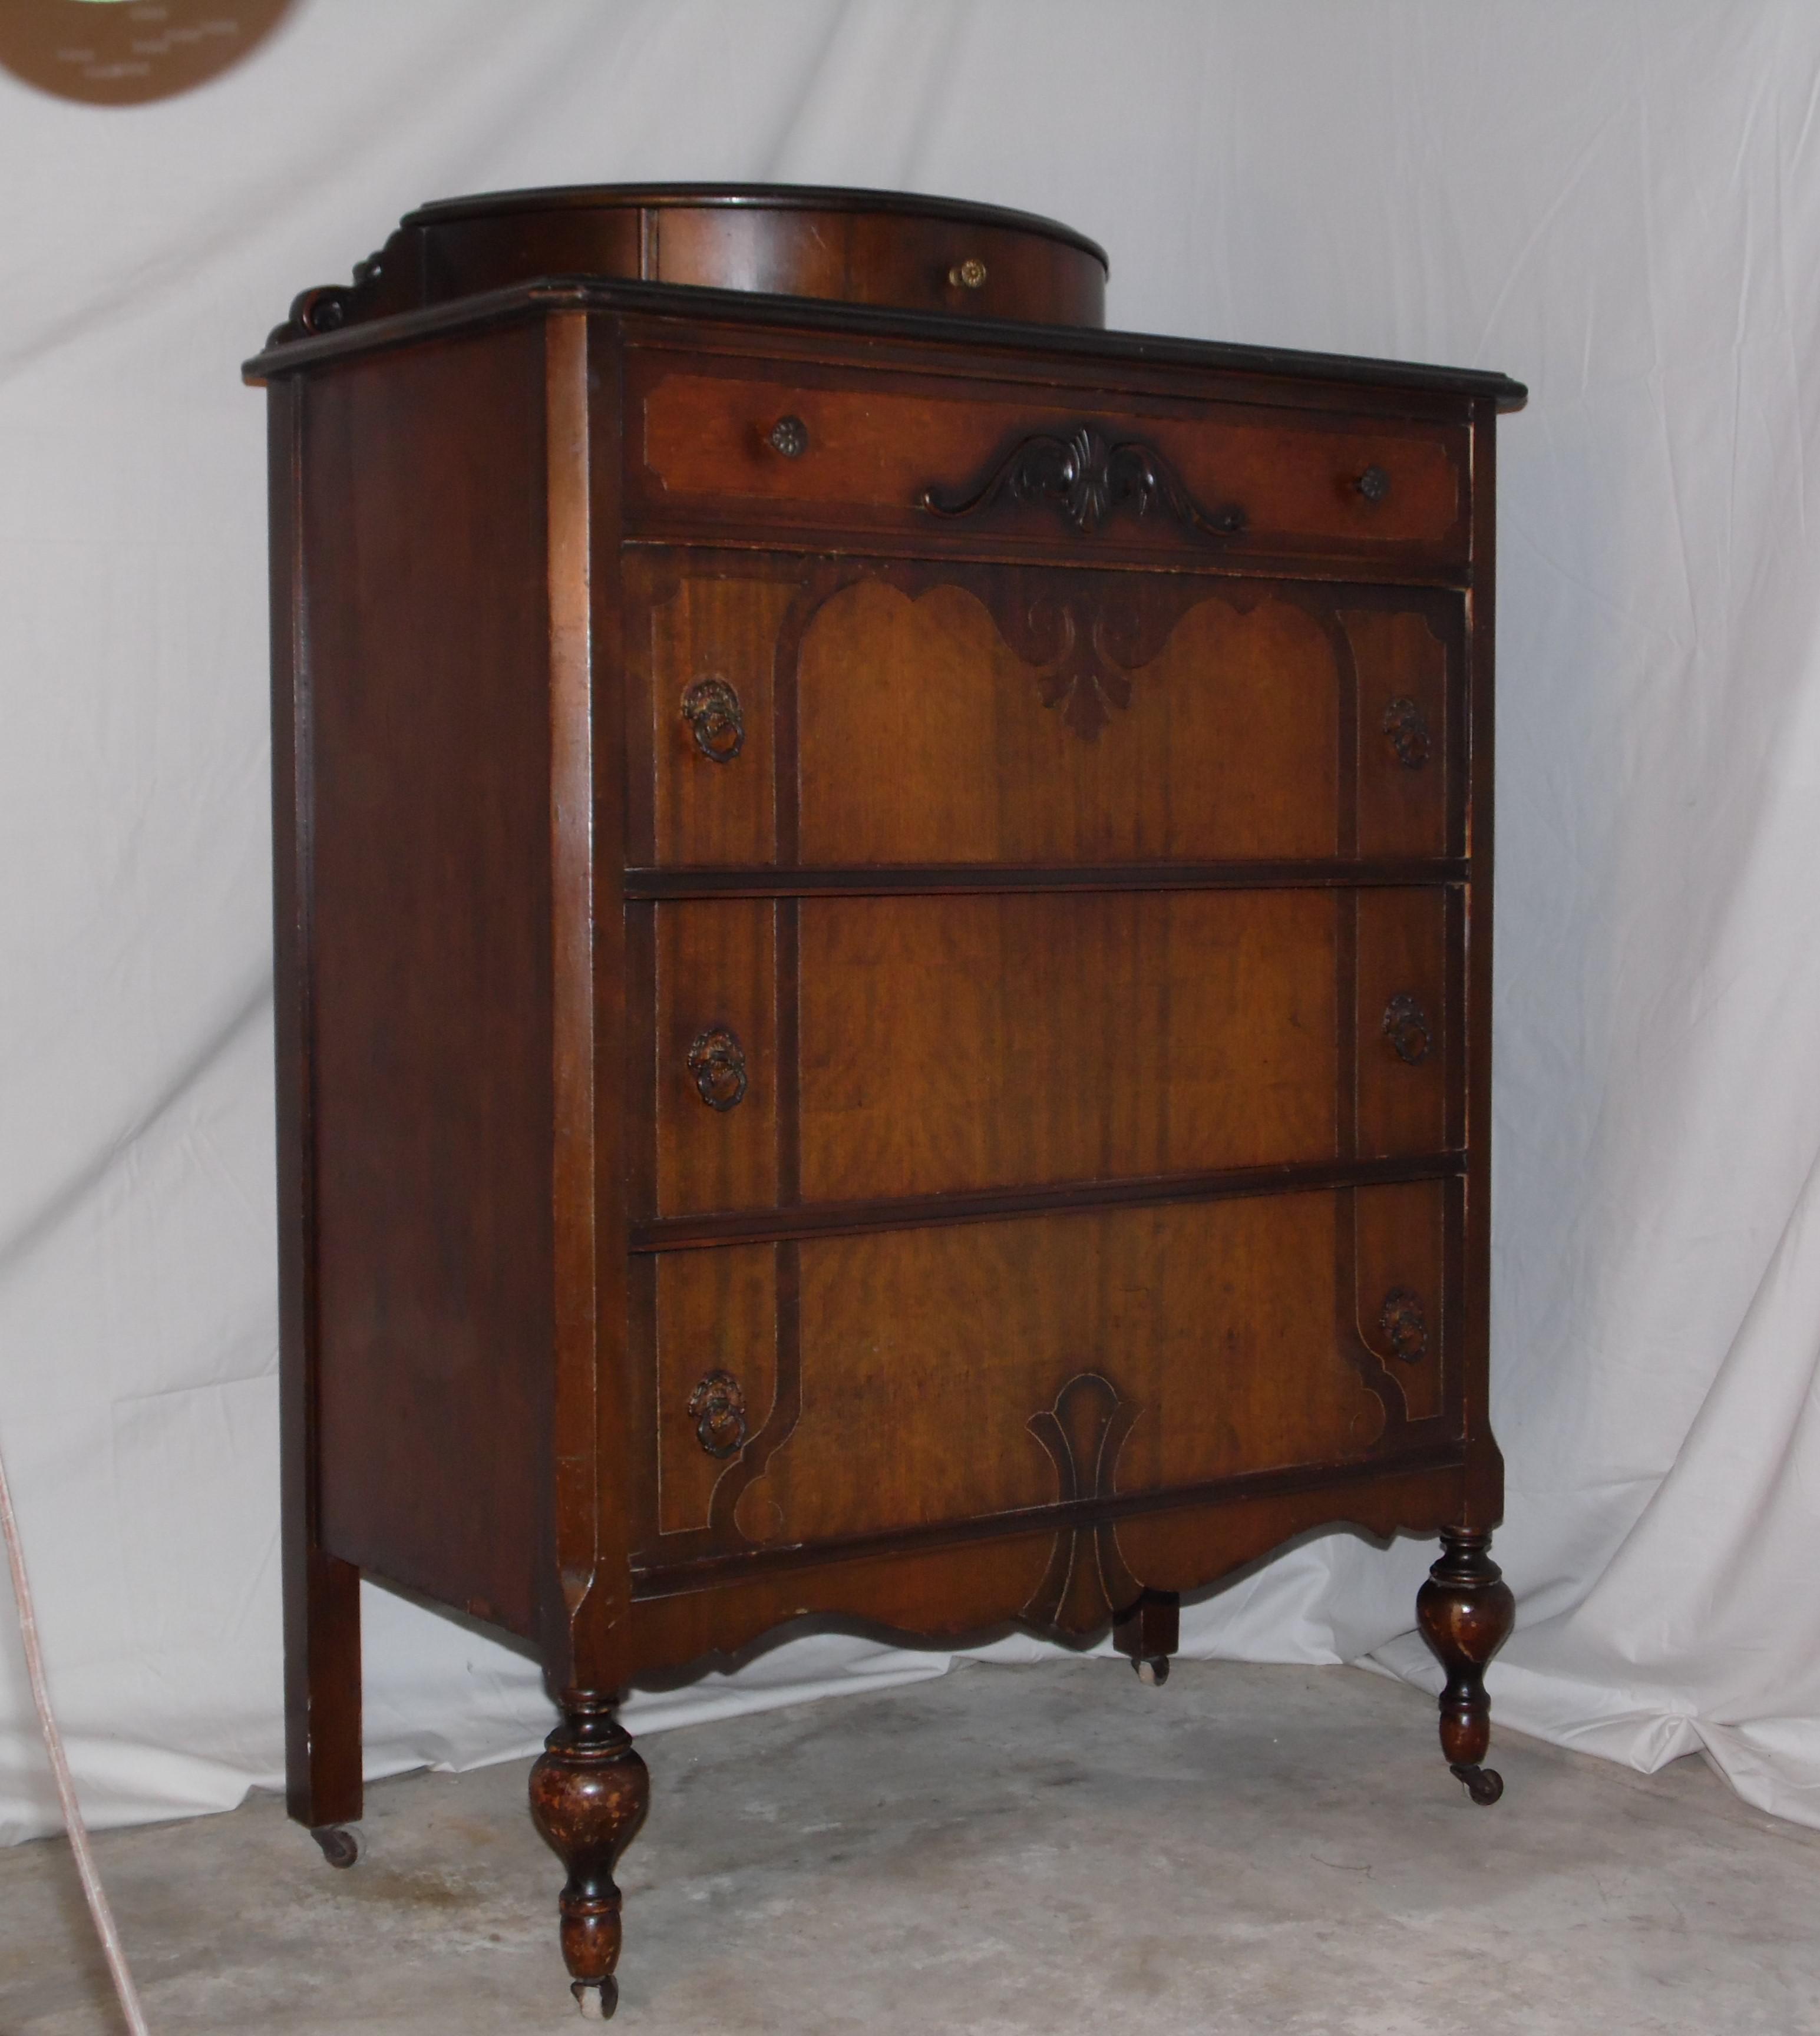 1920s antique art deco walnut dresser bureau chest of drawers demilune top image 8 of